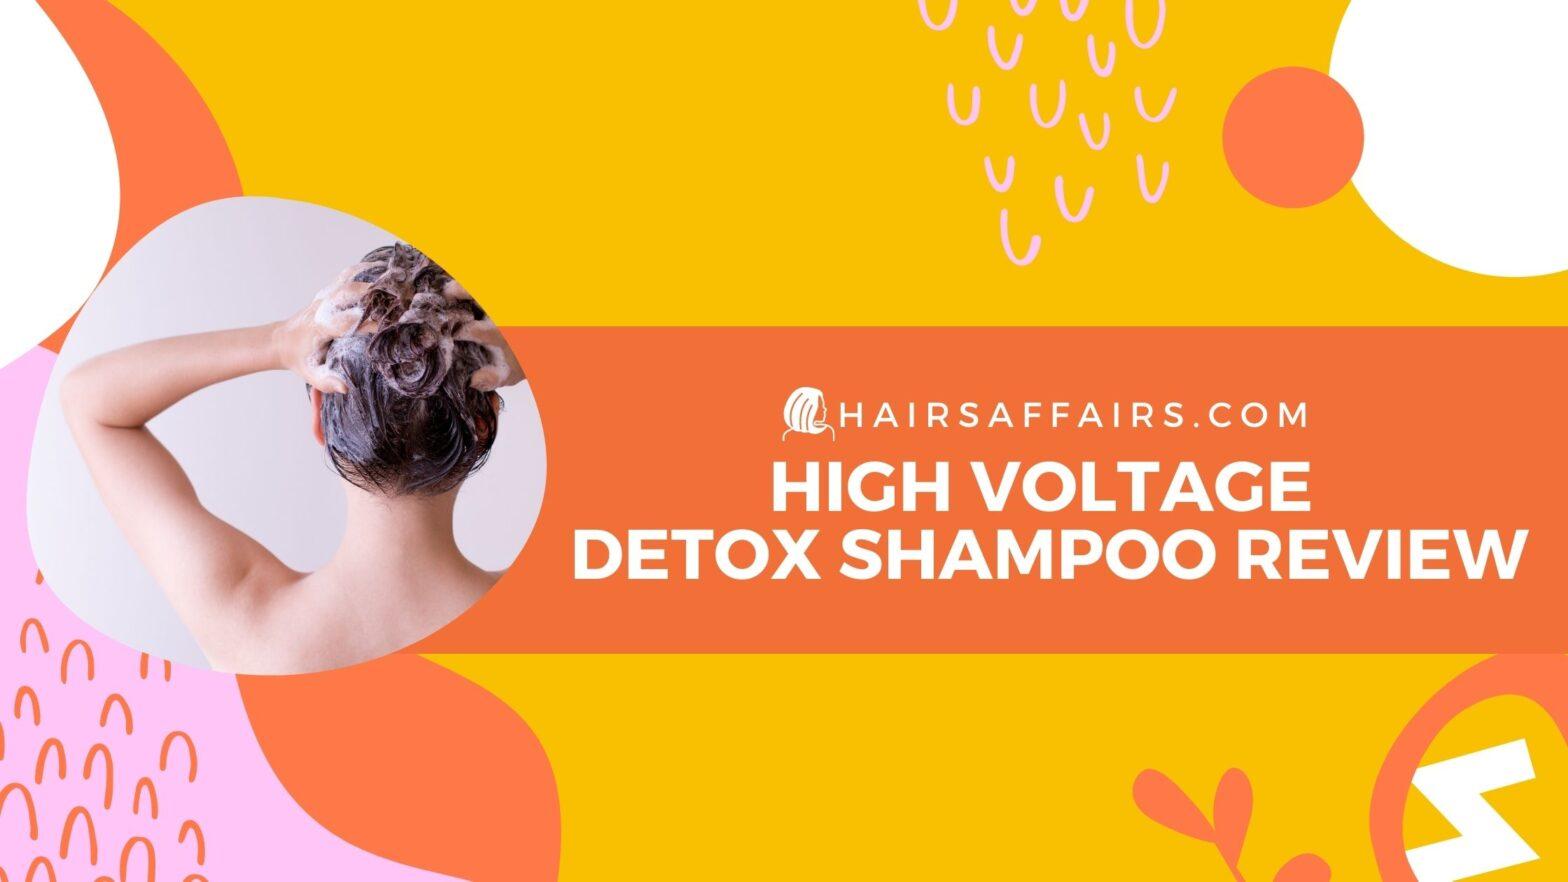 HA-High-Voltage-Detox-Shampoo-Review